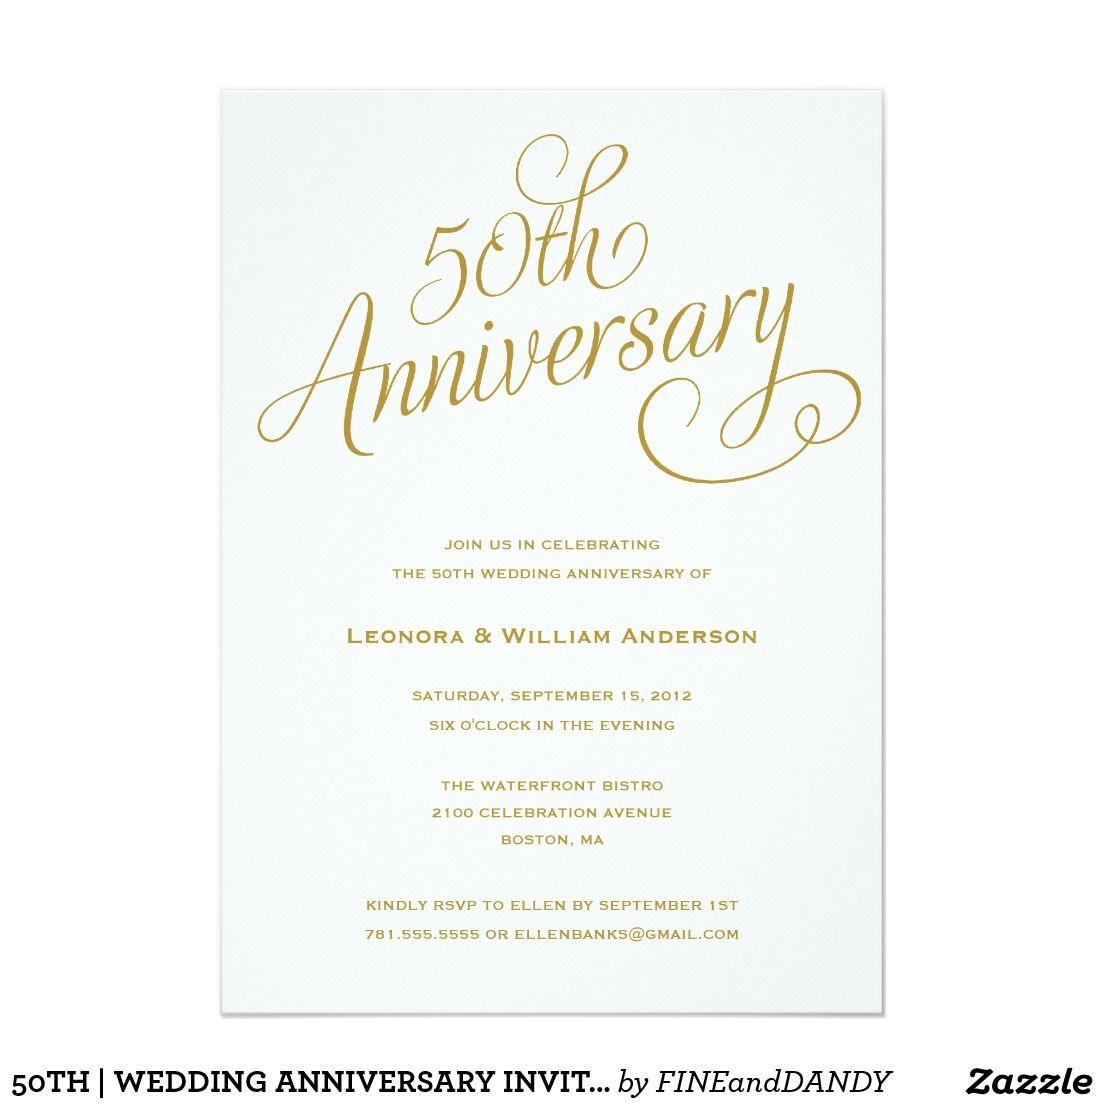 50TH | WEDDING ANNIVERSARY INVITATIONS | Invitations For Every ...